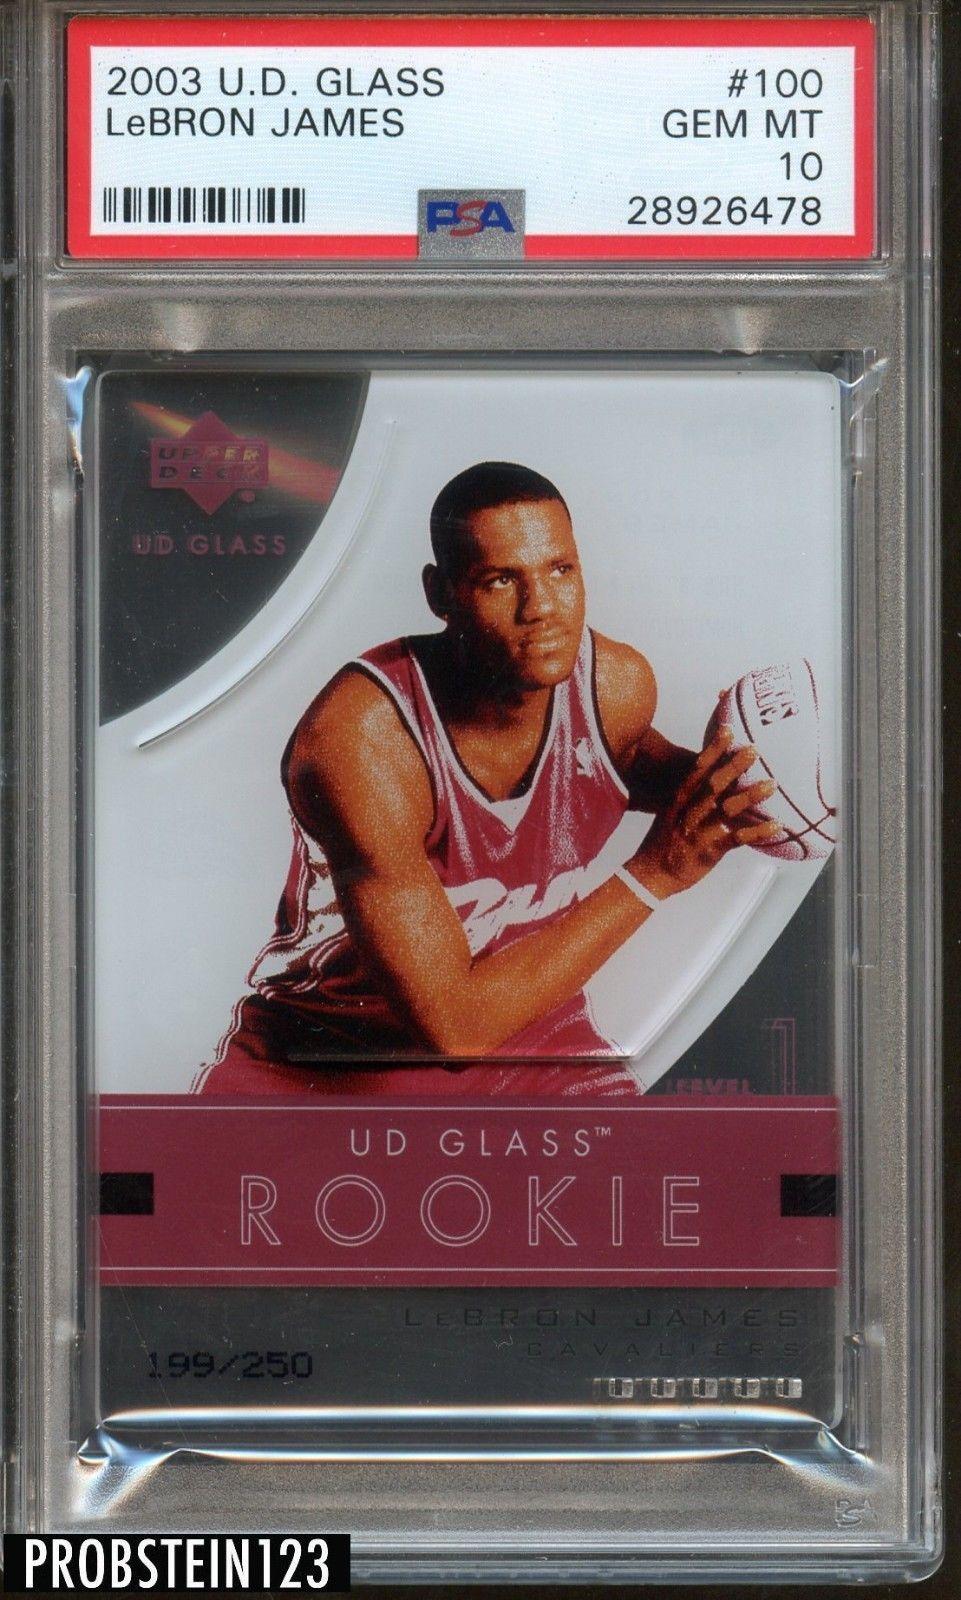 200304 ud glass 100 lebron james cavaliers rc rookie 199